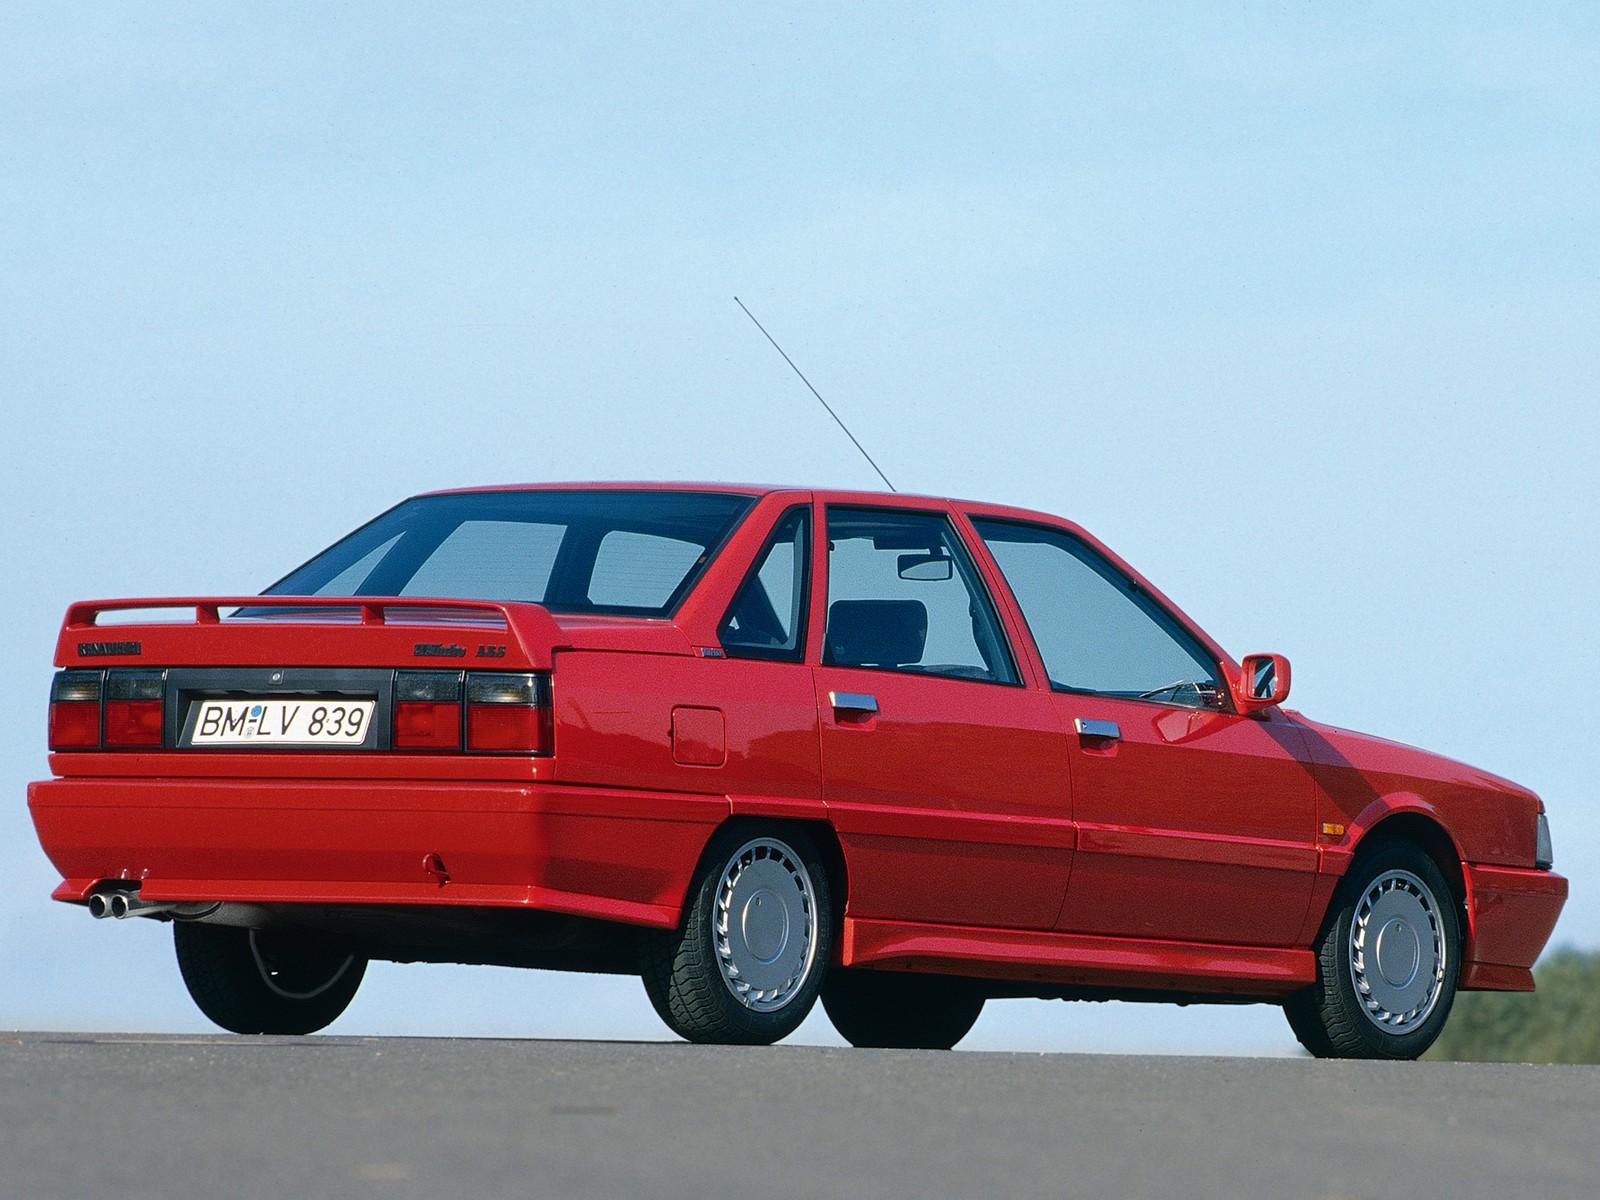 renault 21 sedan specs photos 1989 1990 1991 1992 1993 1994 autoevolution. Black Bedroom Furniture Sets. Home Design Ideas